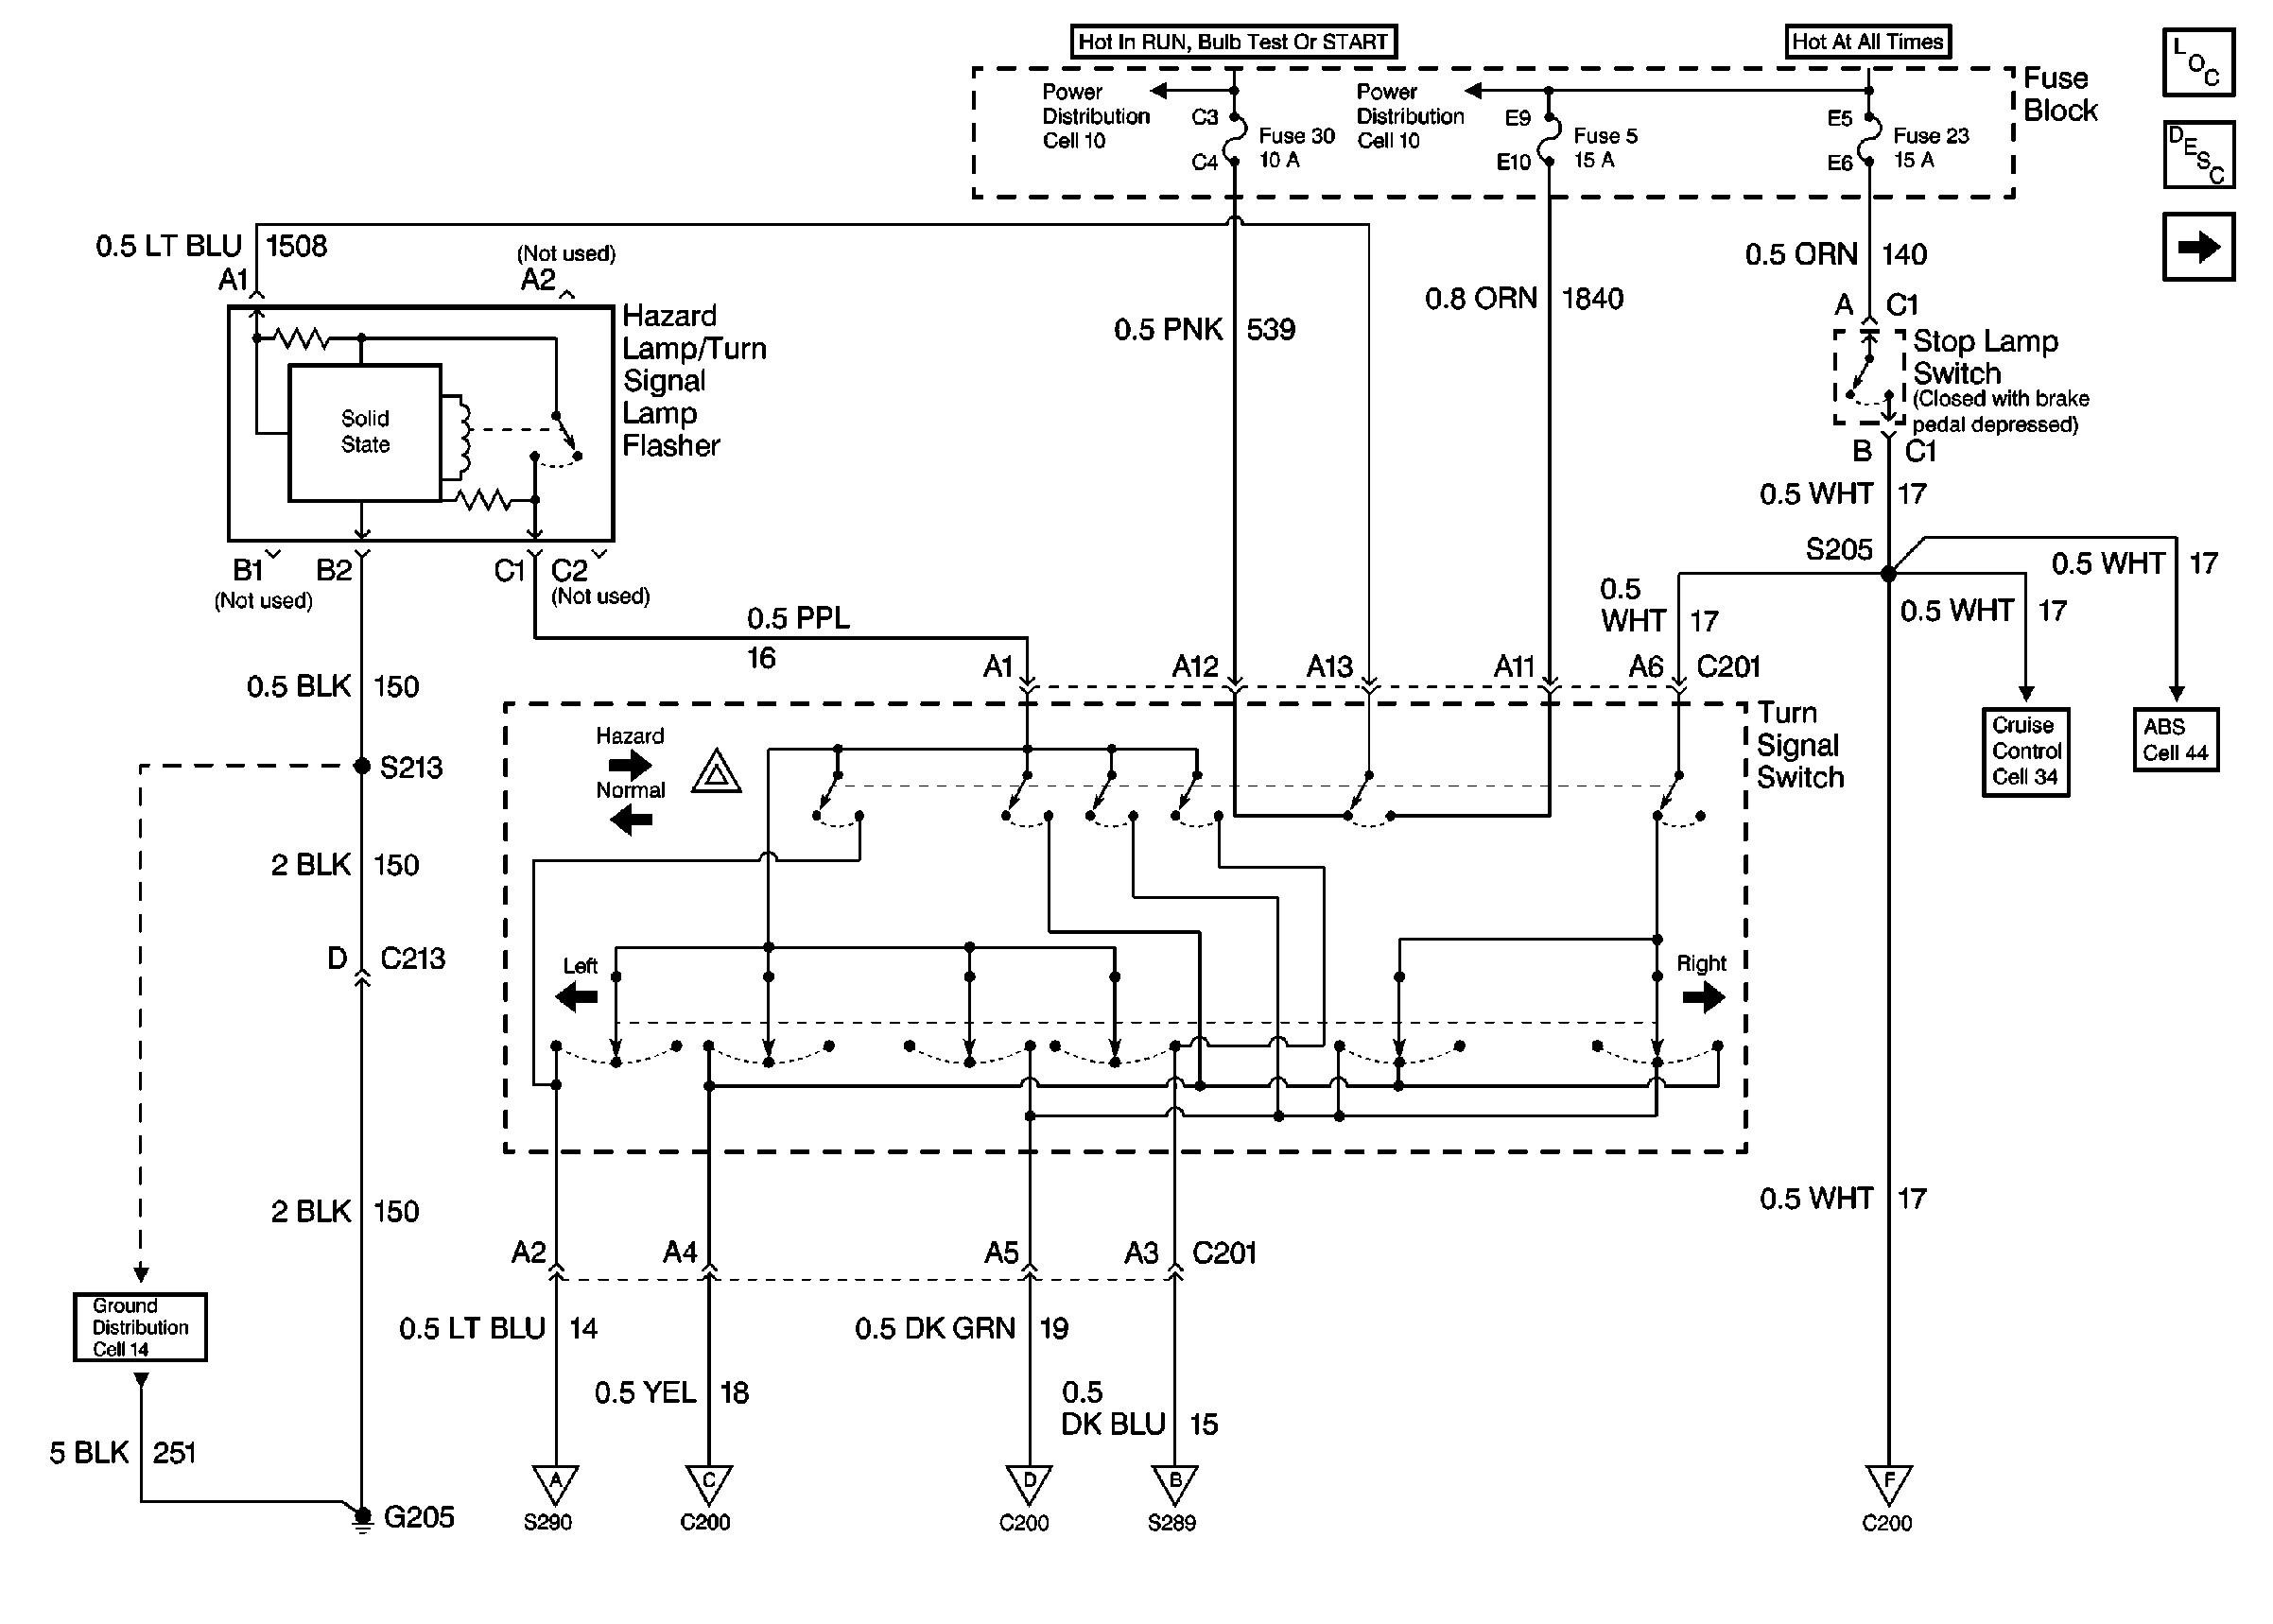 Tail Light Wiring Diagram Chevy Elegant Chevy Trailblazer Tail Light Wiring Diagram Wiring Diagrams